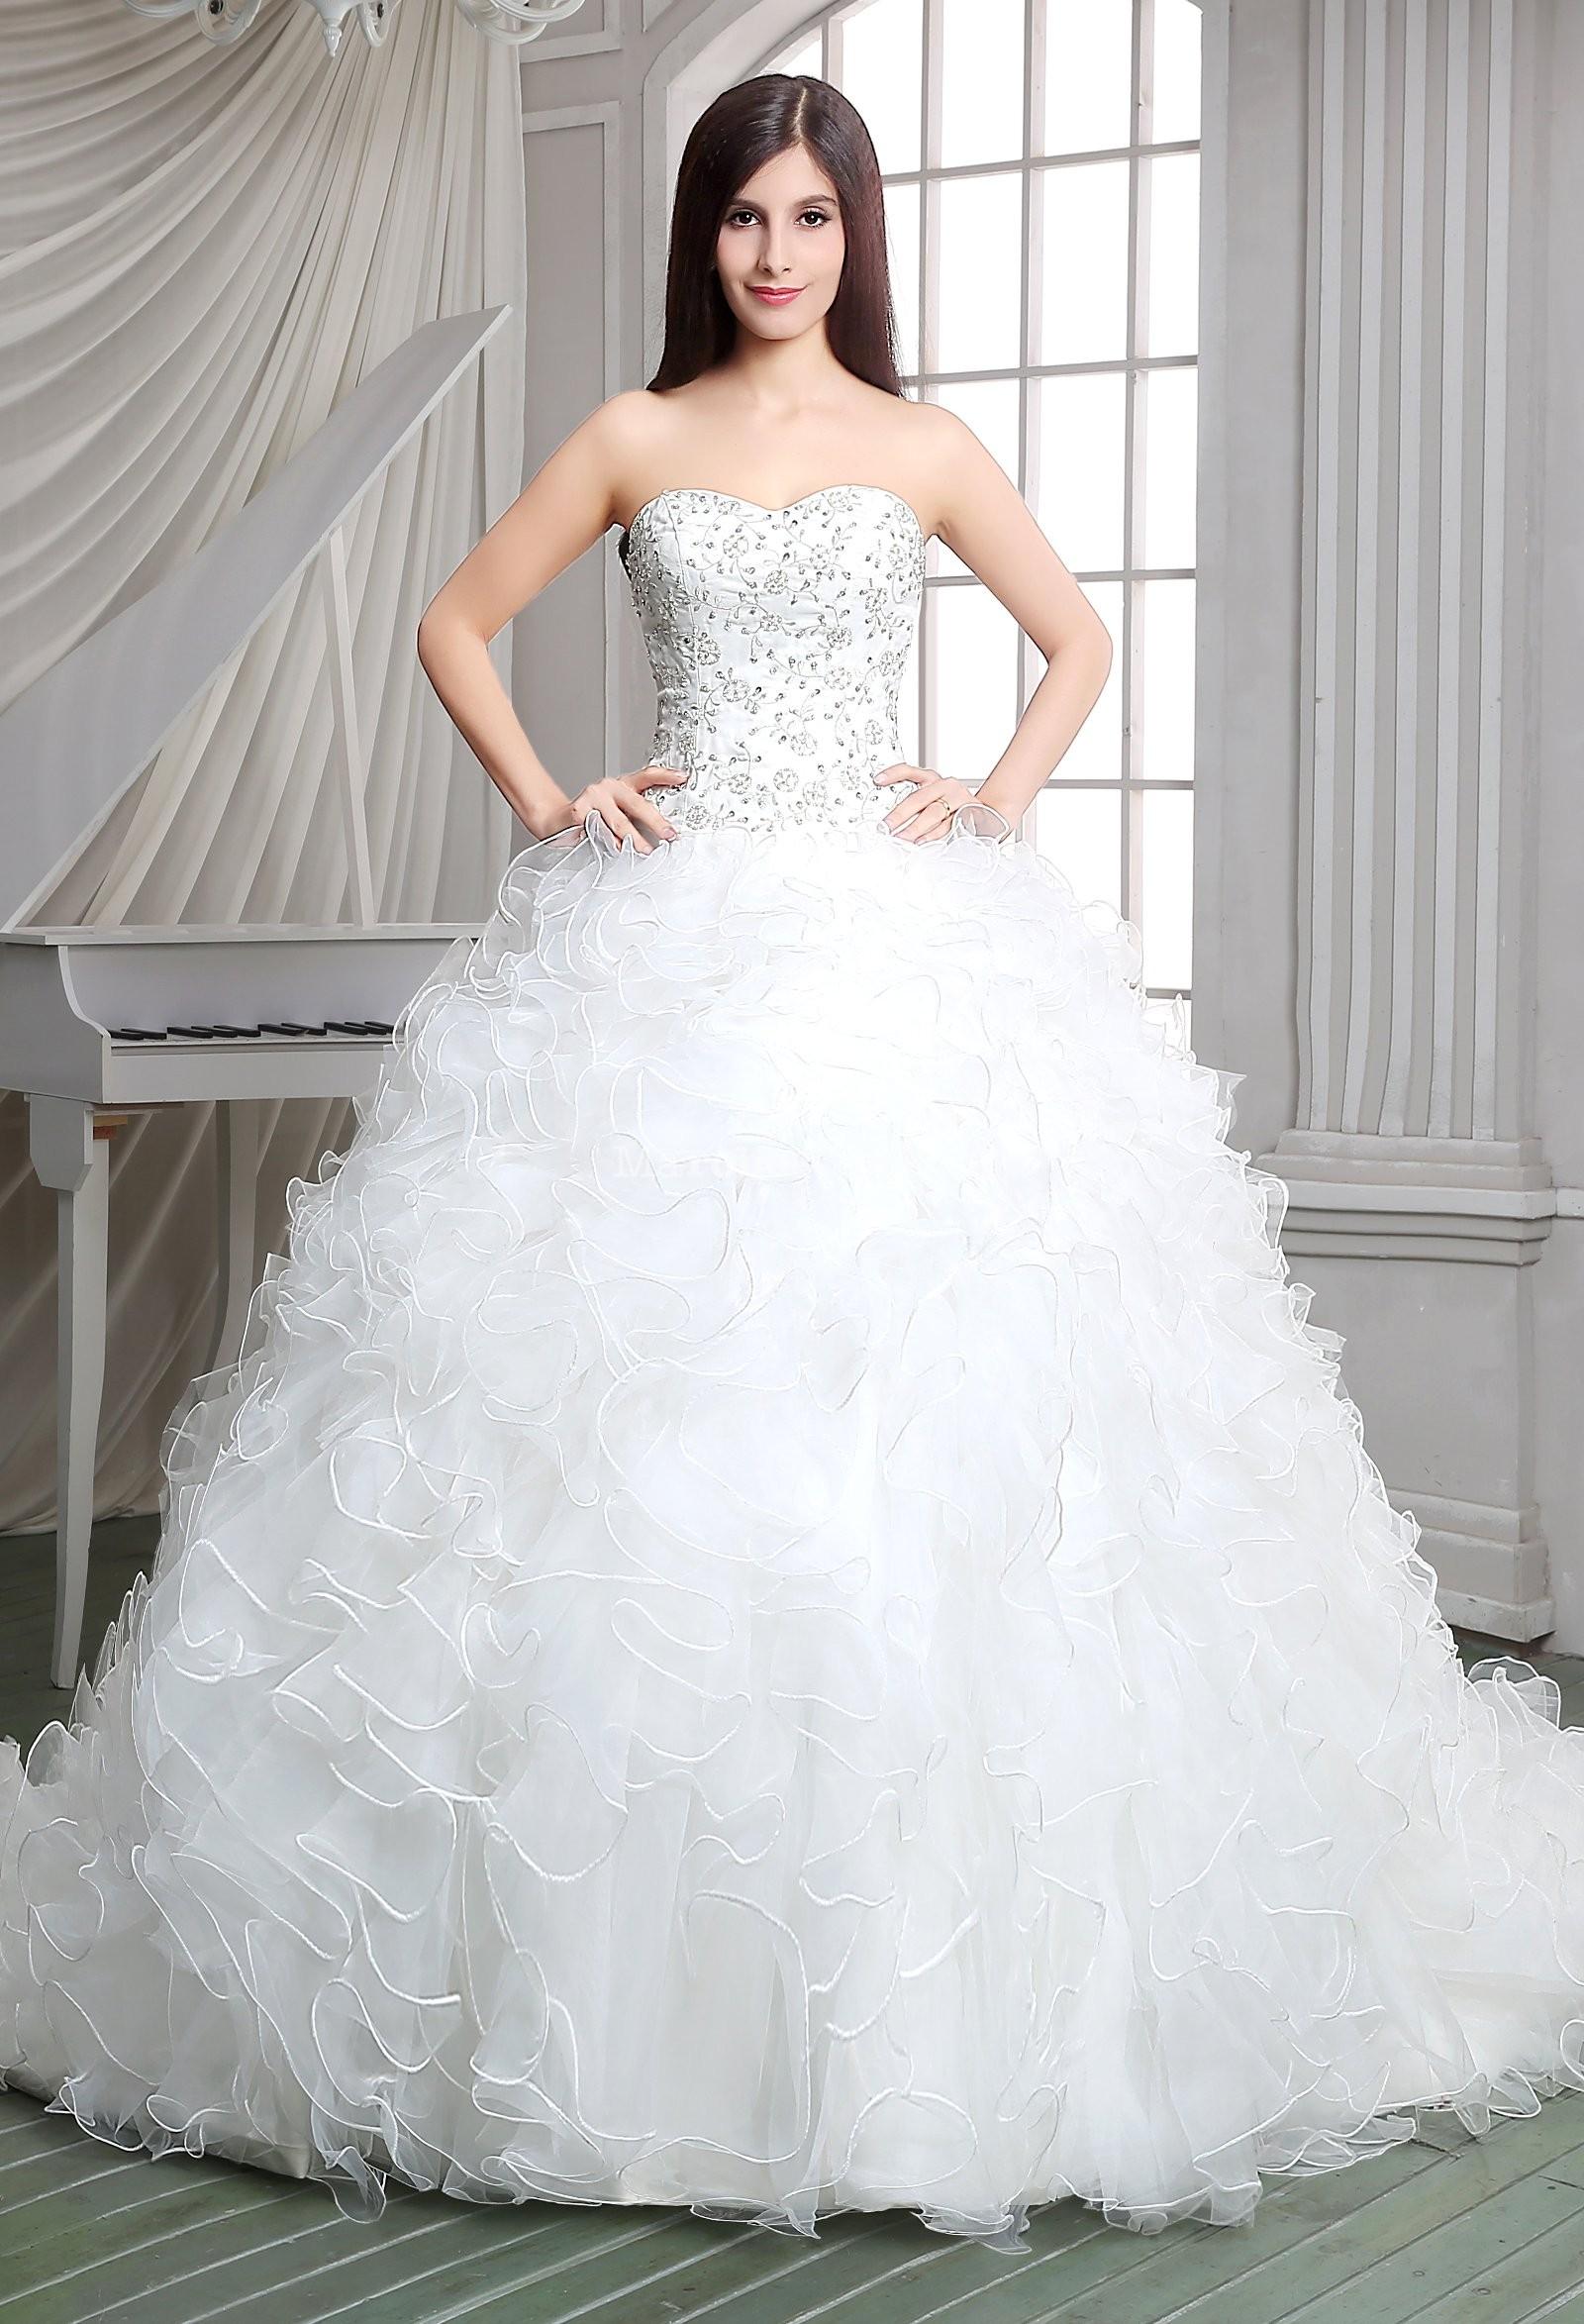 Robe de mariée princesse froufrou réf SQ114 - sur demande en Organza